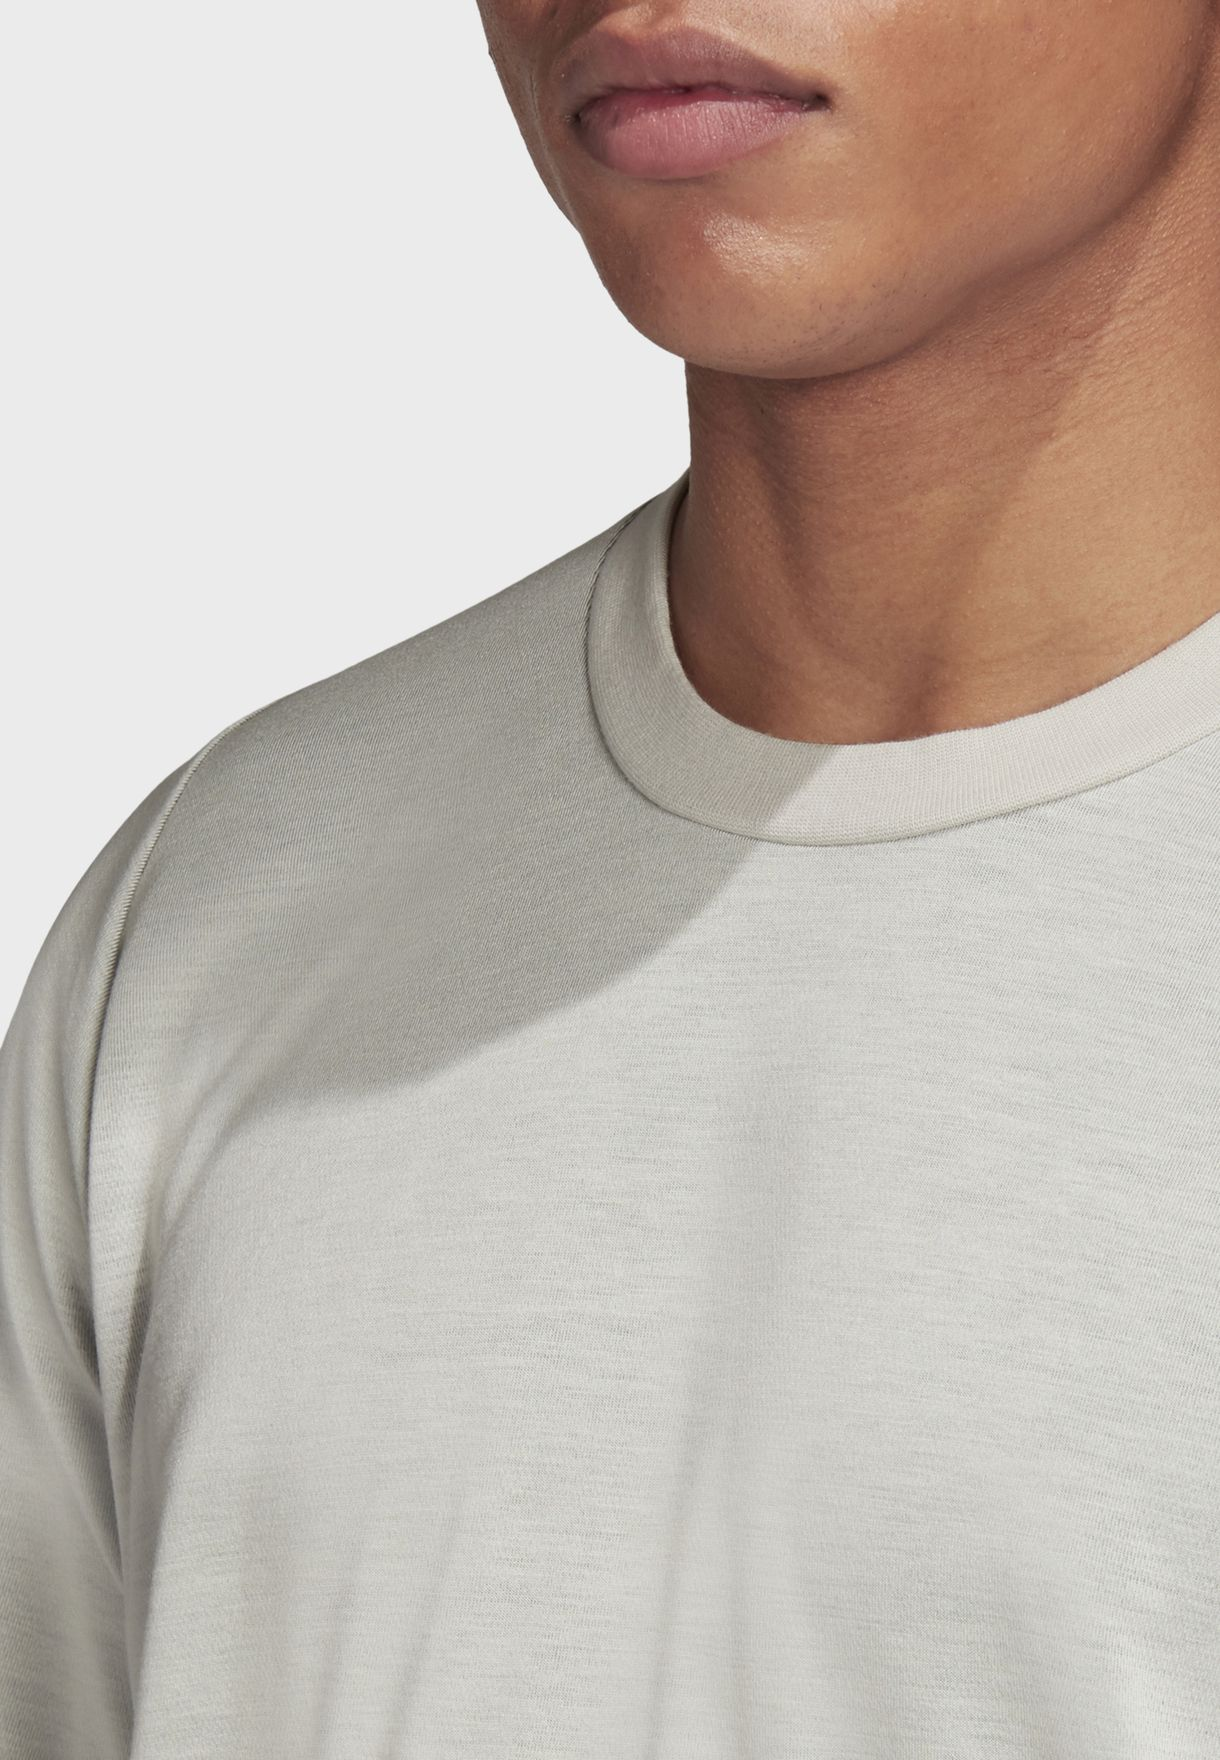 Inside Mesh T-Shirt